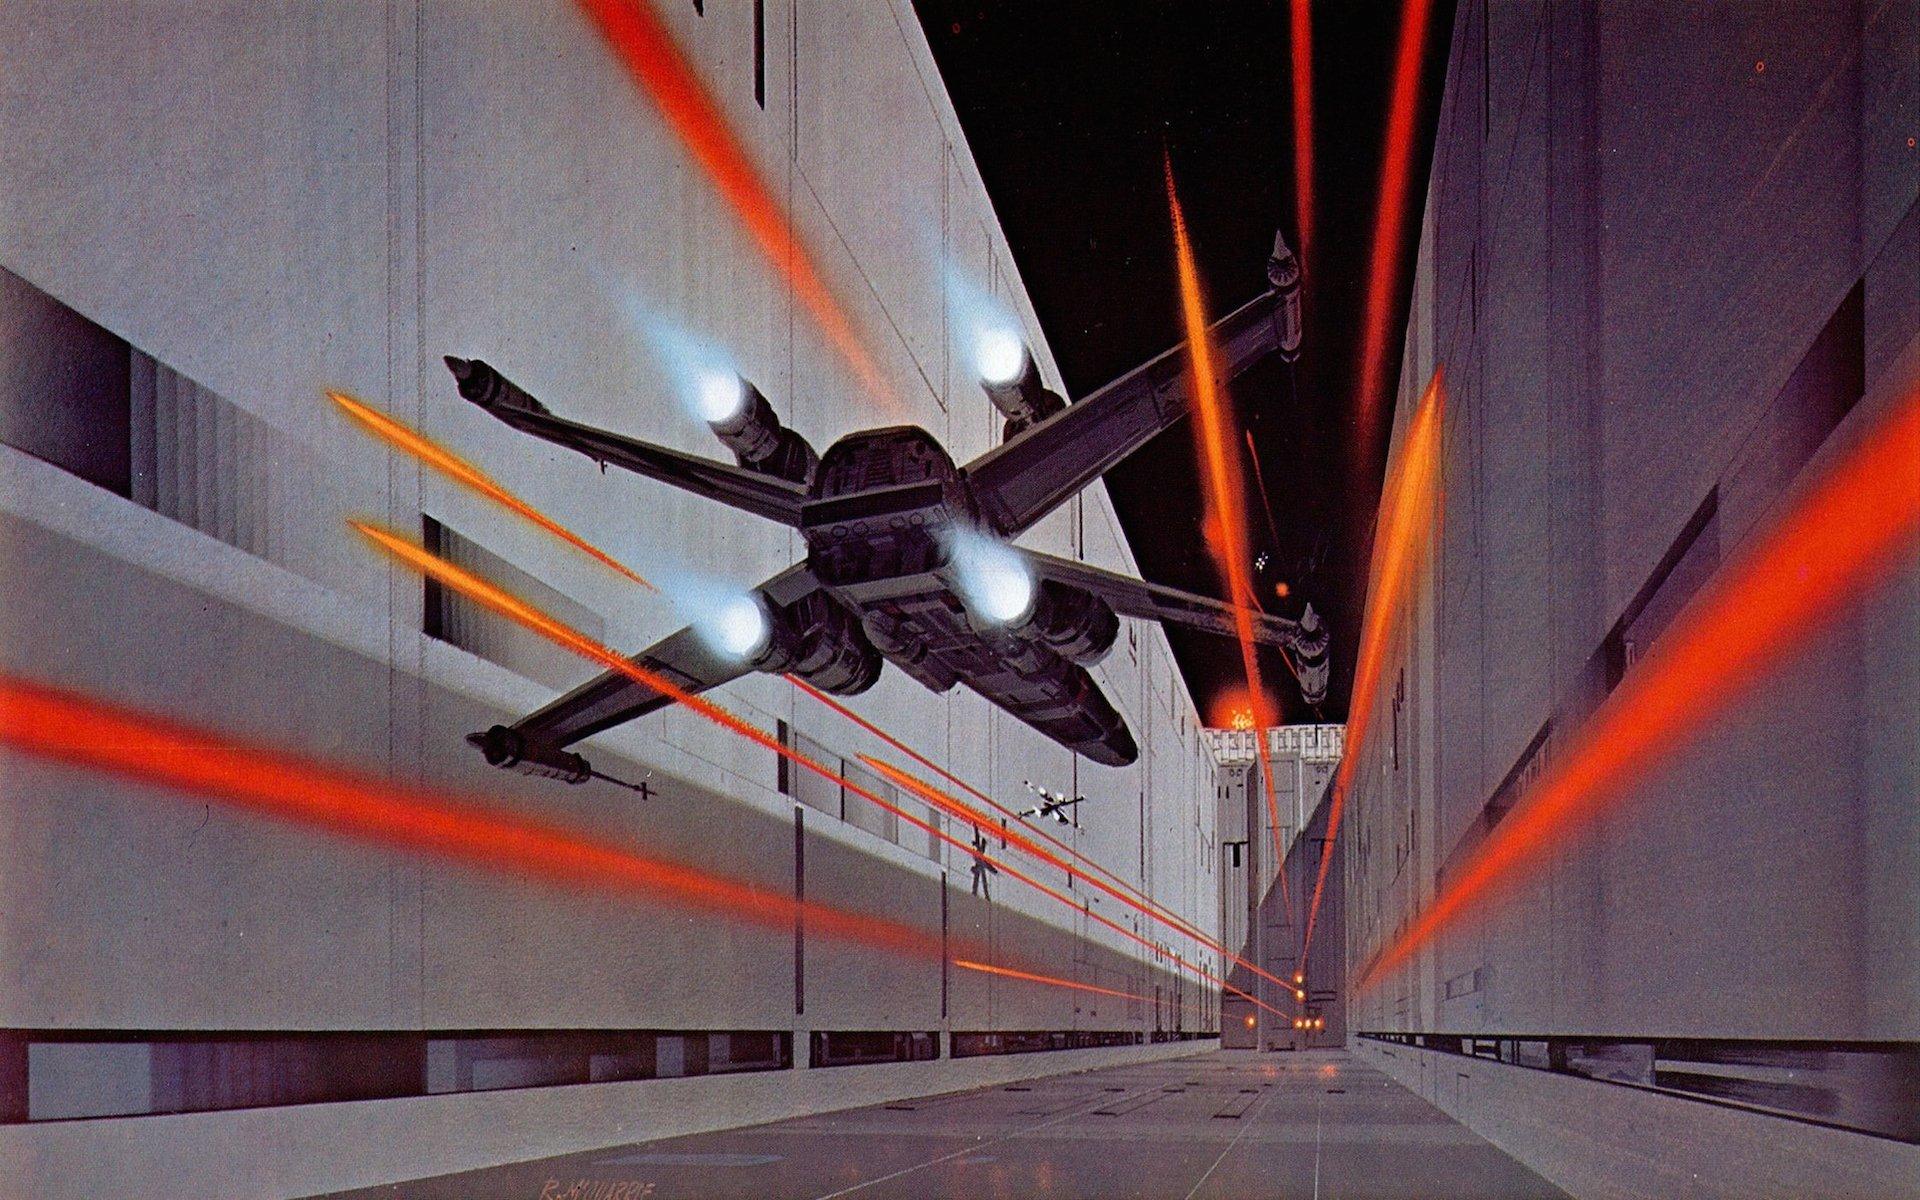 Star Wars Hd Wallpaper Background Image 1920x1200 Id 639827 Wallpaper Abyss